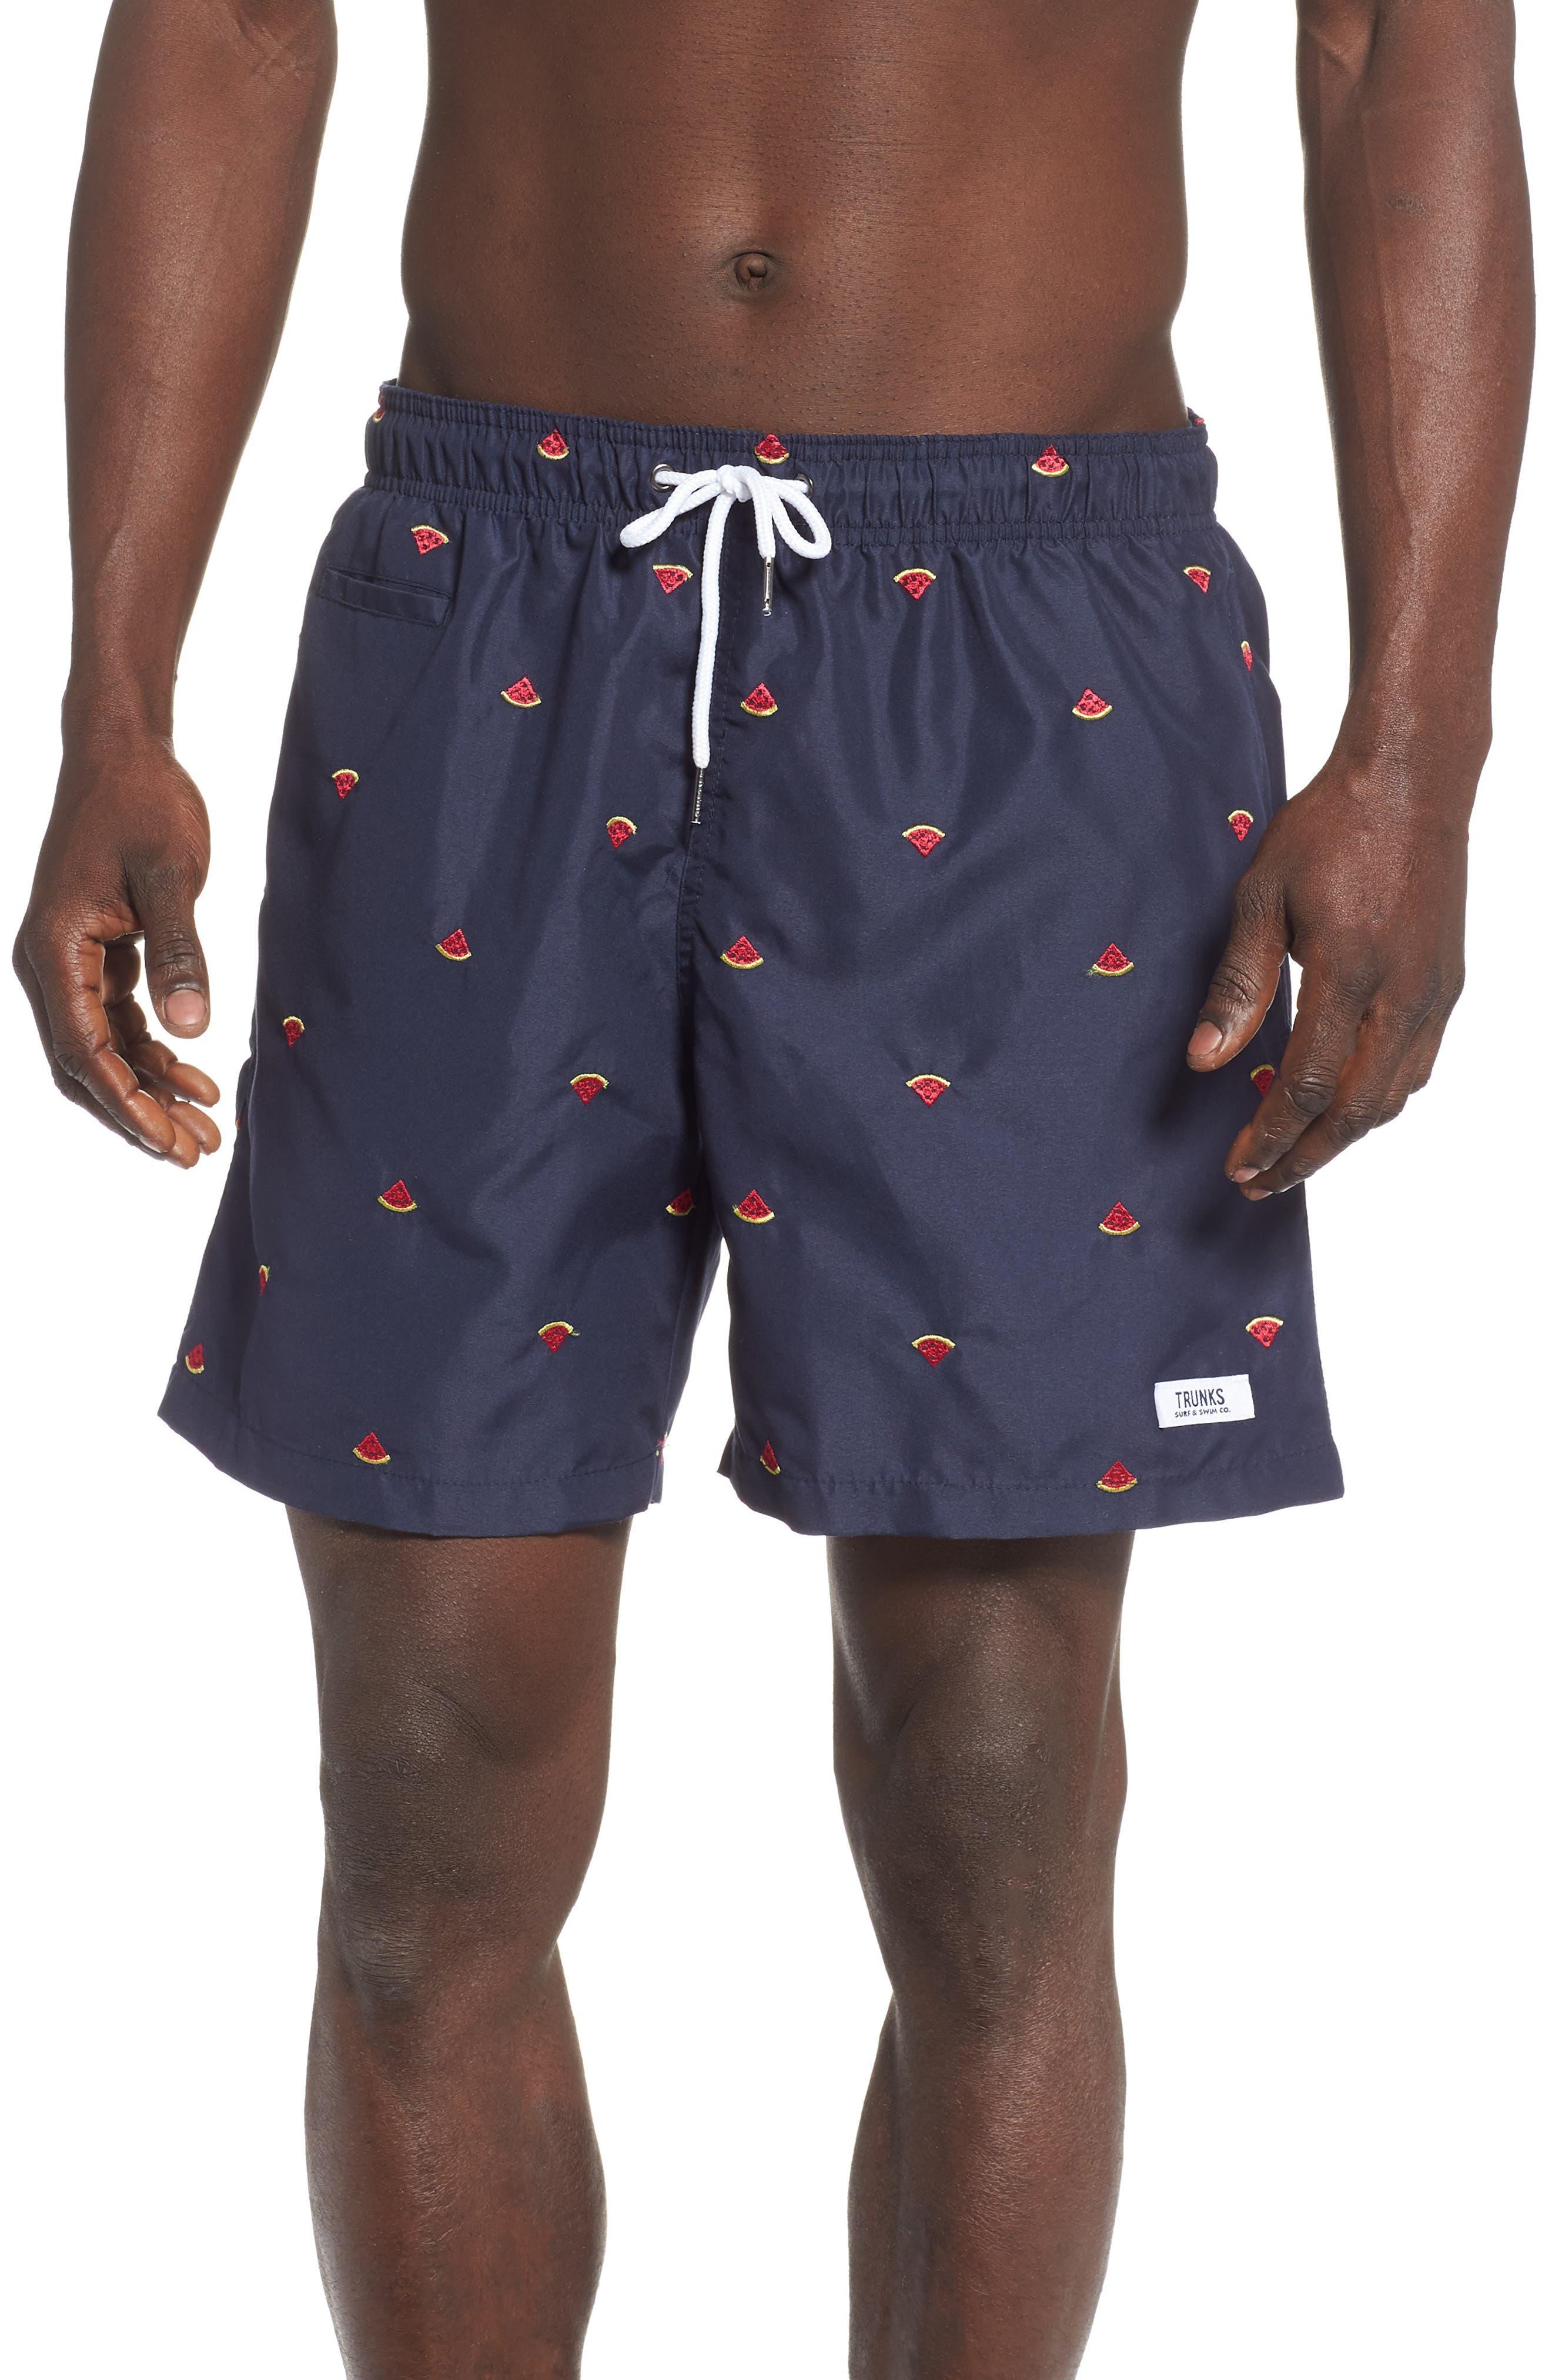 Premium Embroidered Sano Swim Trunks,                             Main thumbnail 1, color,                             WATERMELON DRAWING